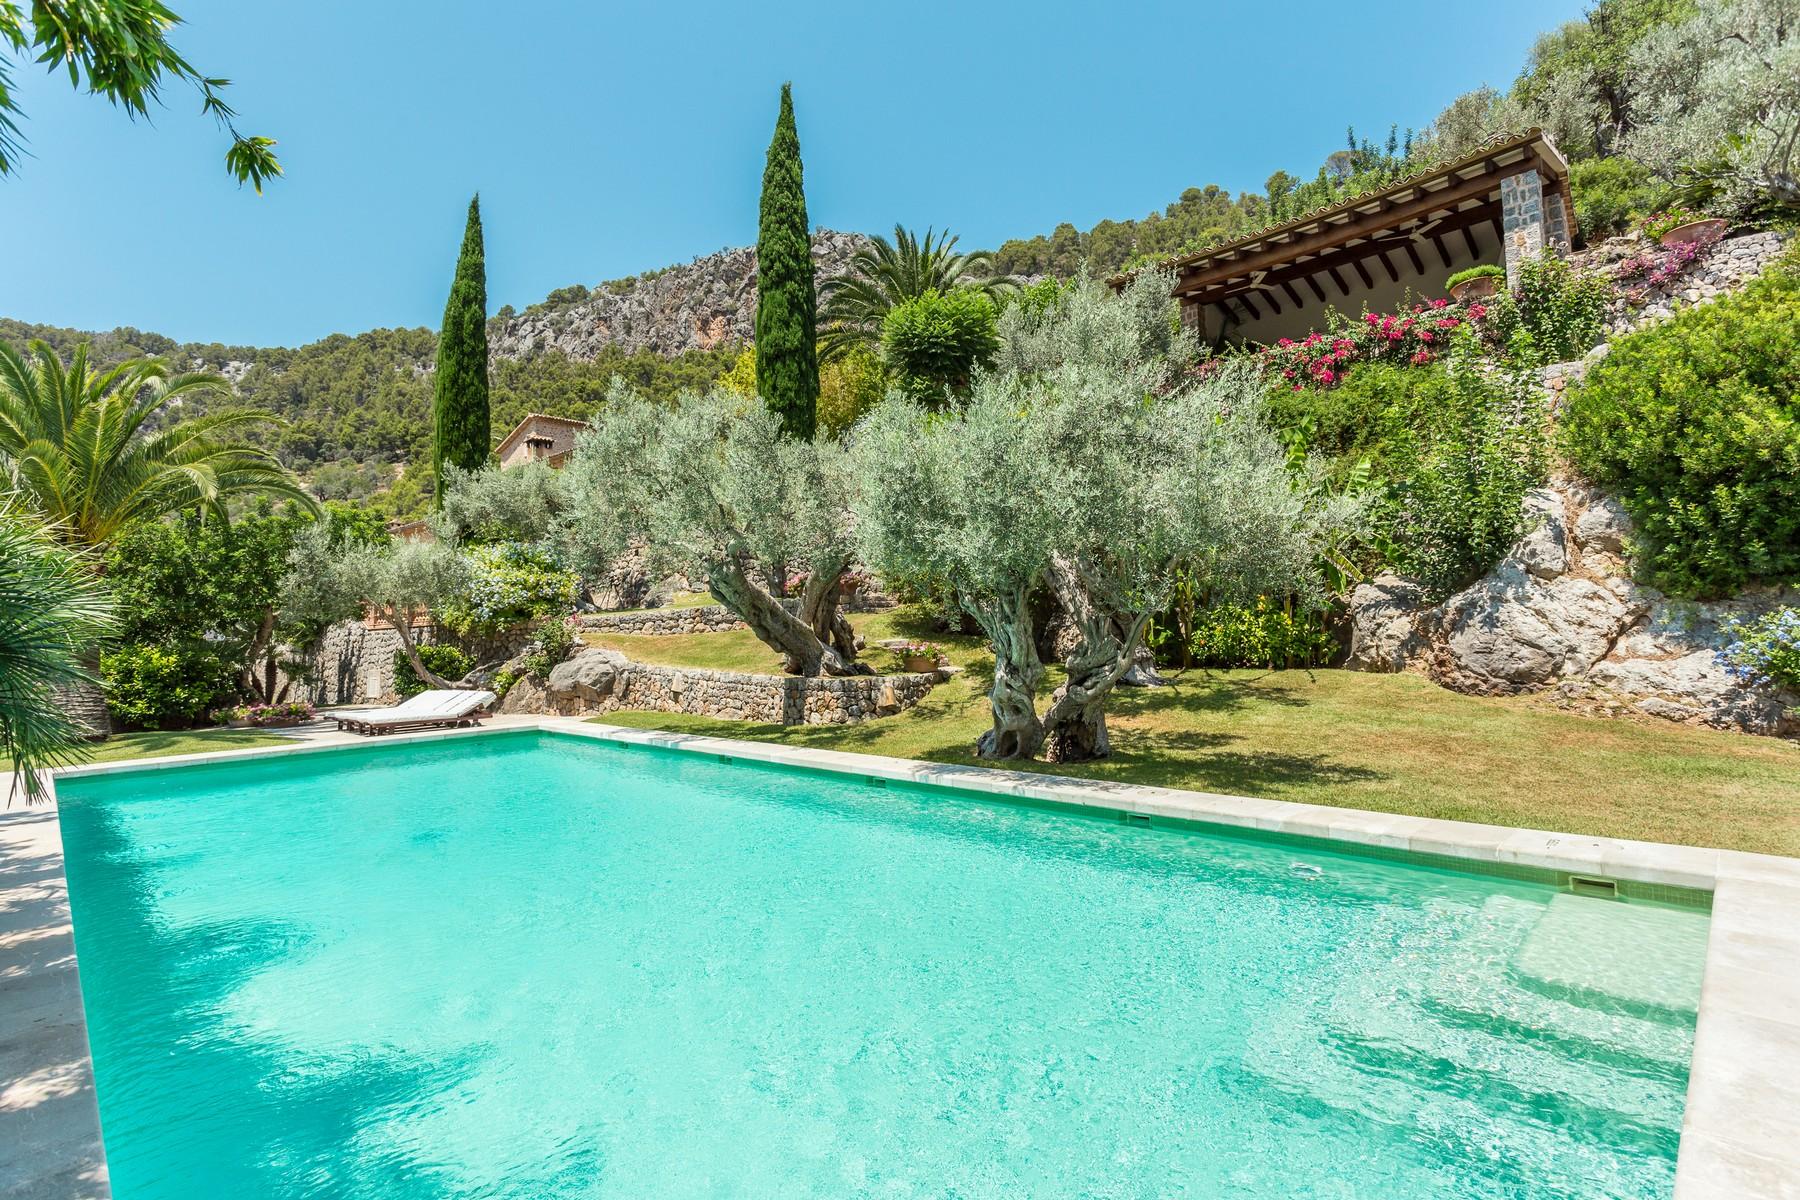 Casa Unifamiliar por un Alquiler en Impressive villa with panoramic views in Soller Other Balearic Islands, Balearic Islands, 07100 España